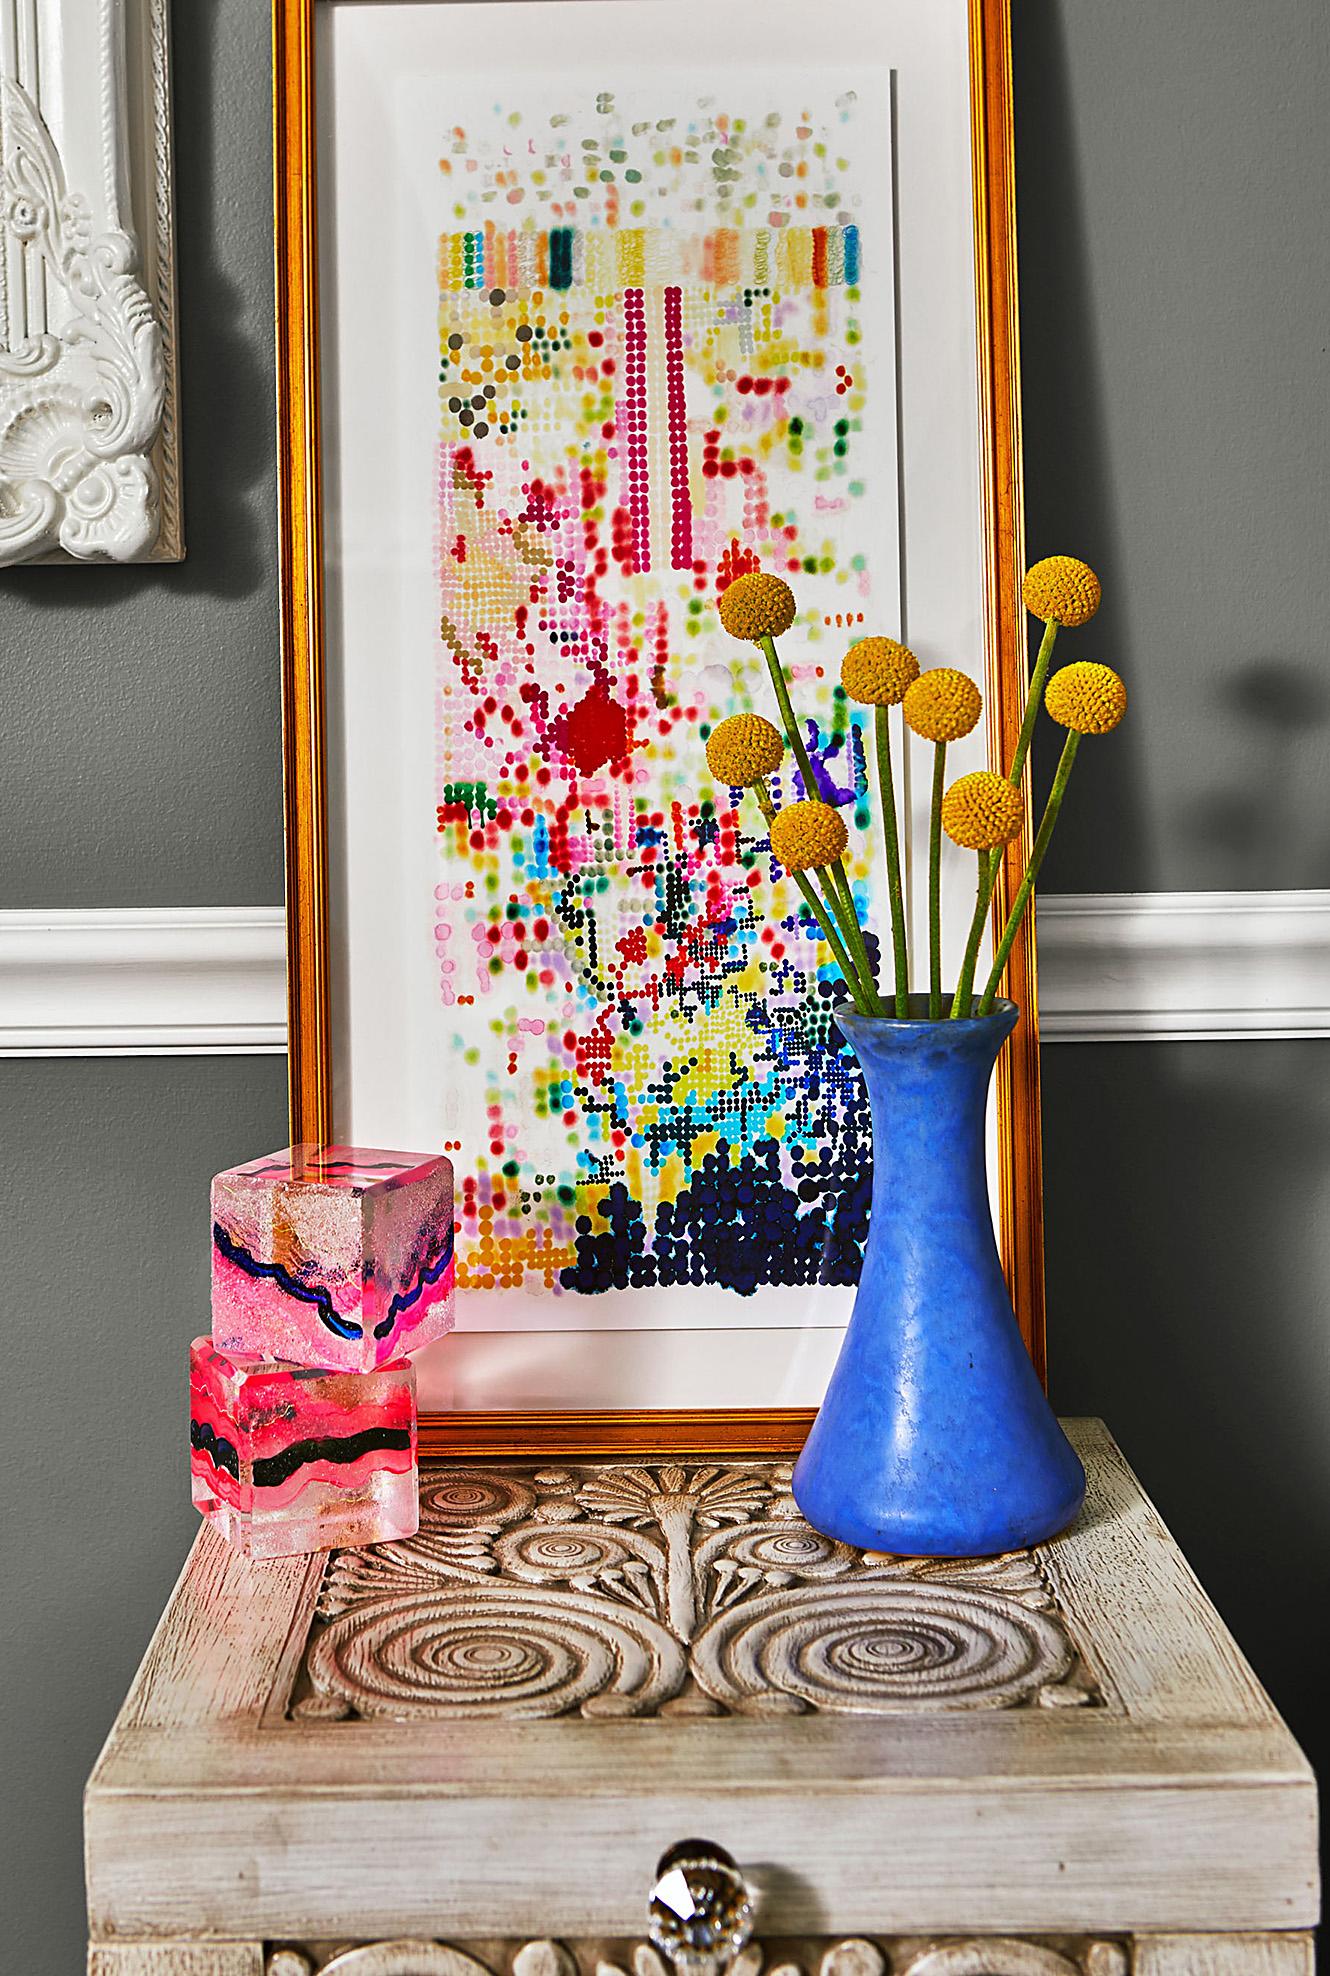 table with framed artwork sculpture cubes vase